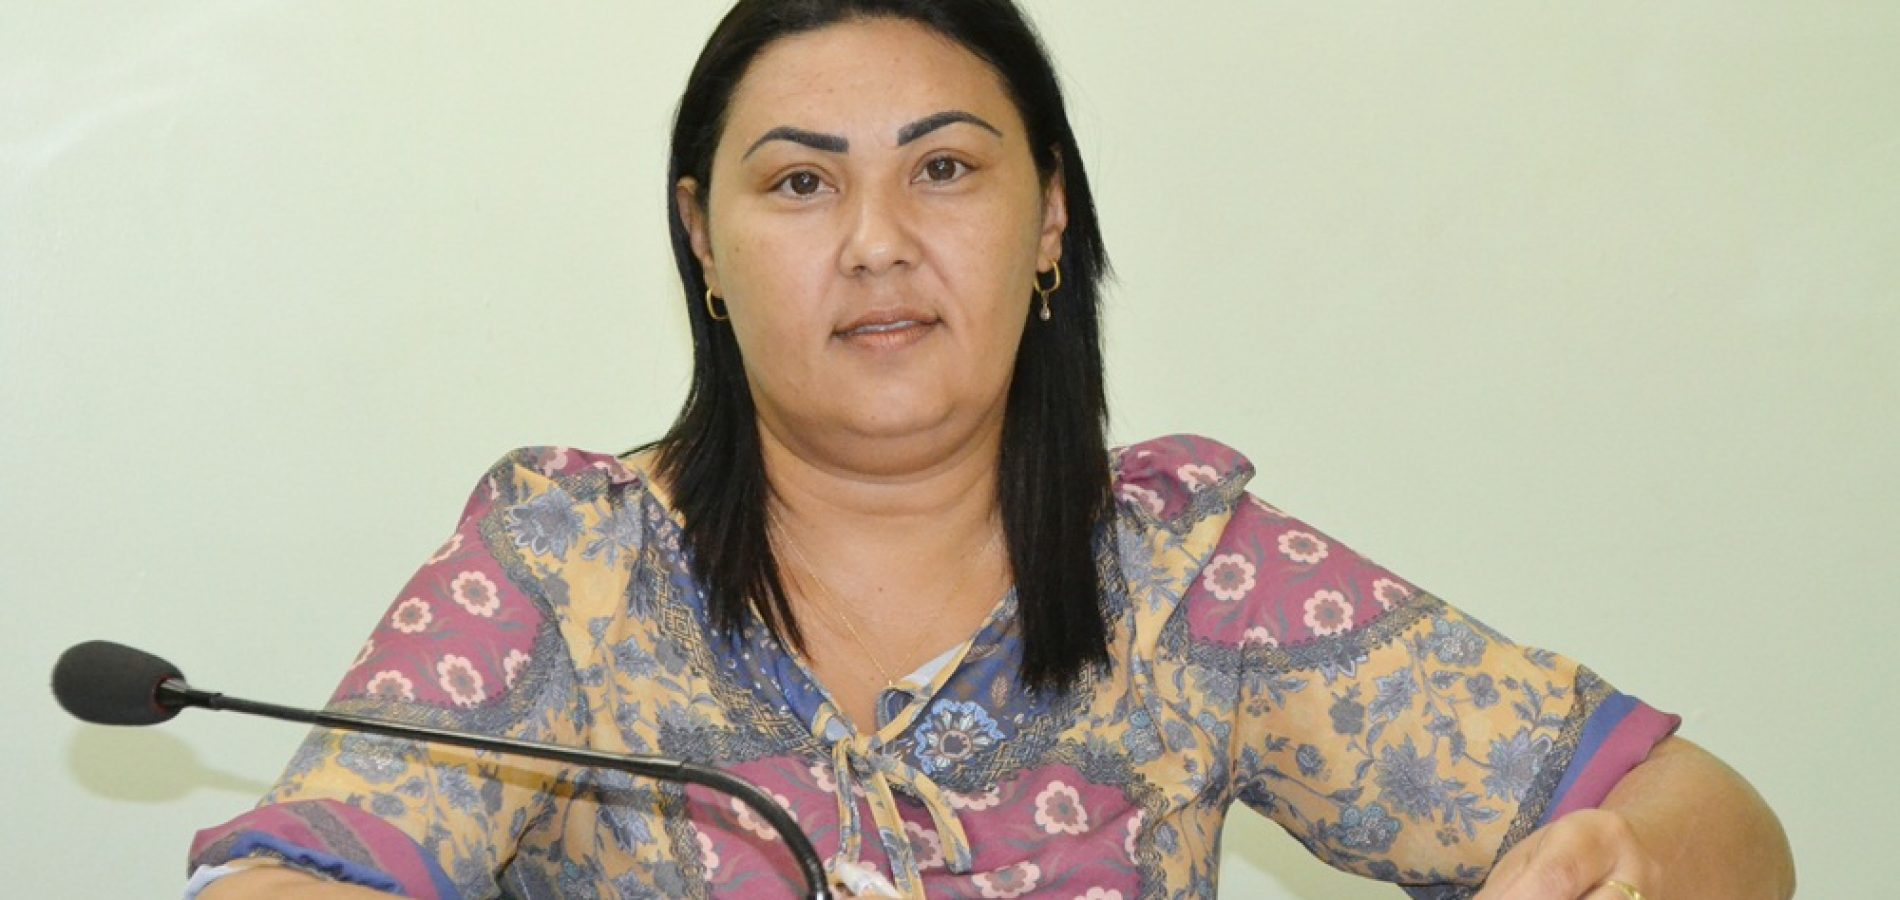 JAICÓS   Após ser vítima de crime virtual, vereadora Francisca divulga nota de esclarecimento